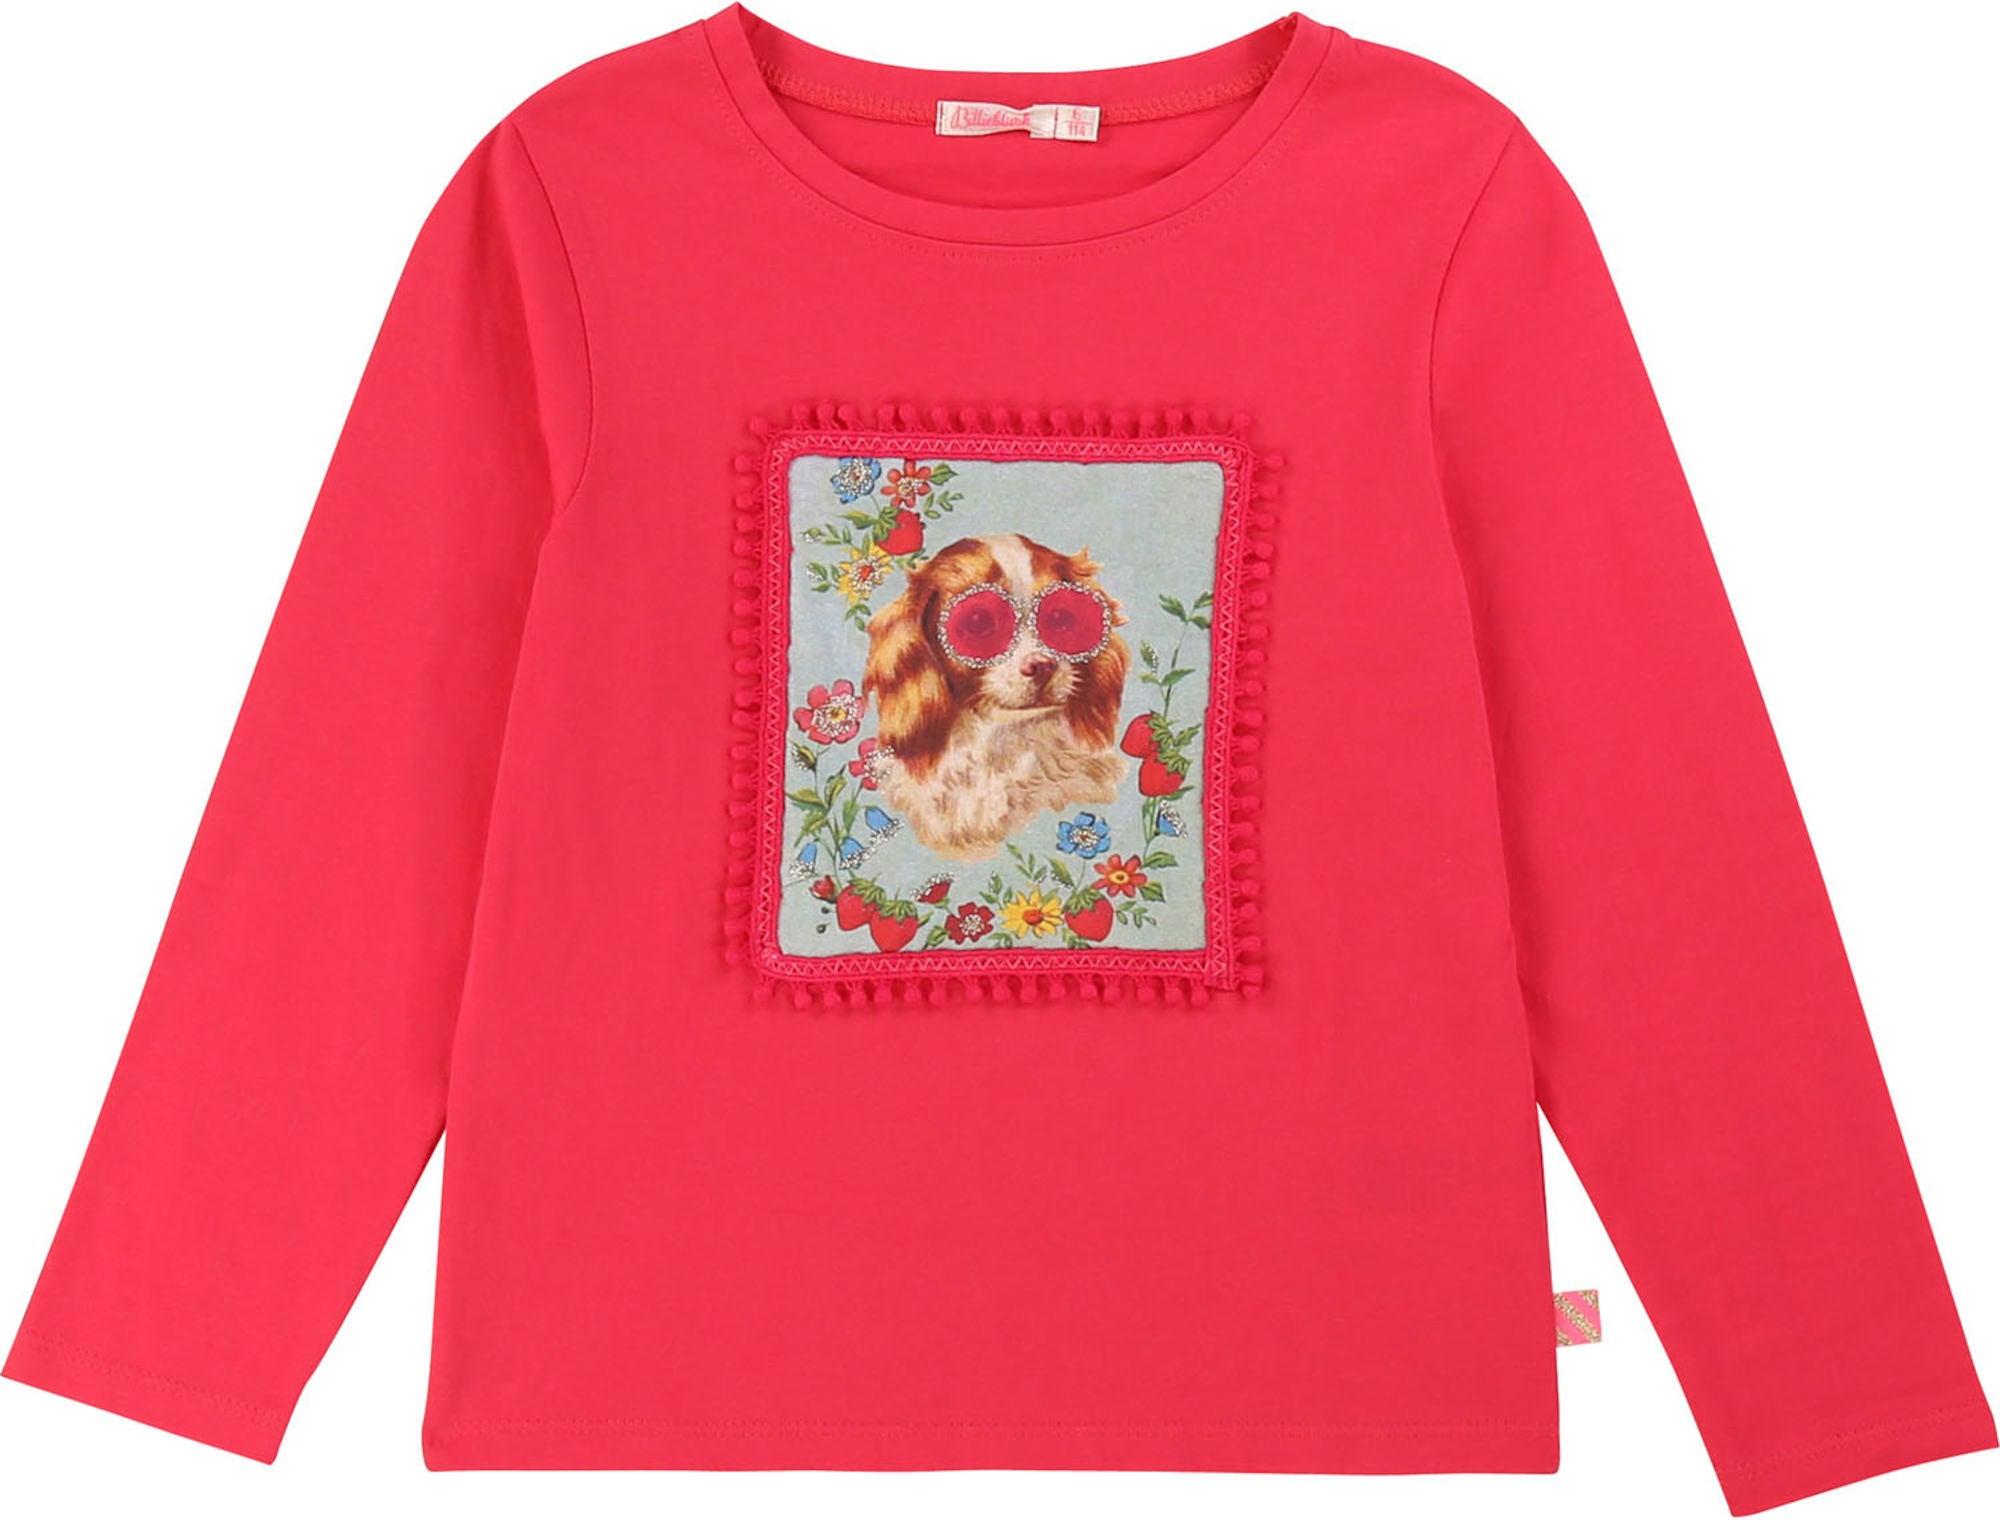 Billieblush T-Shirt, Cranberries 3 år